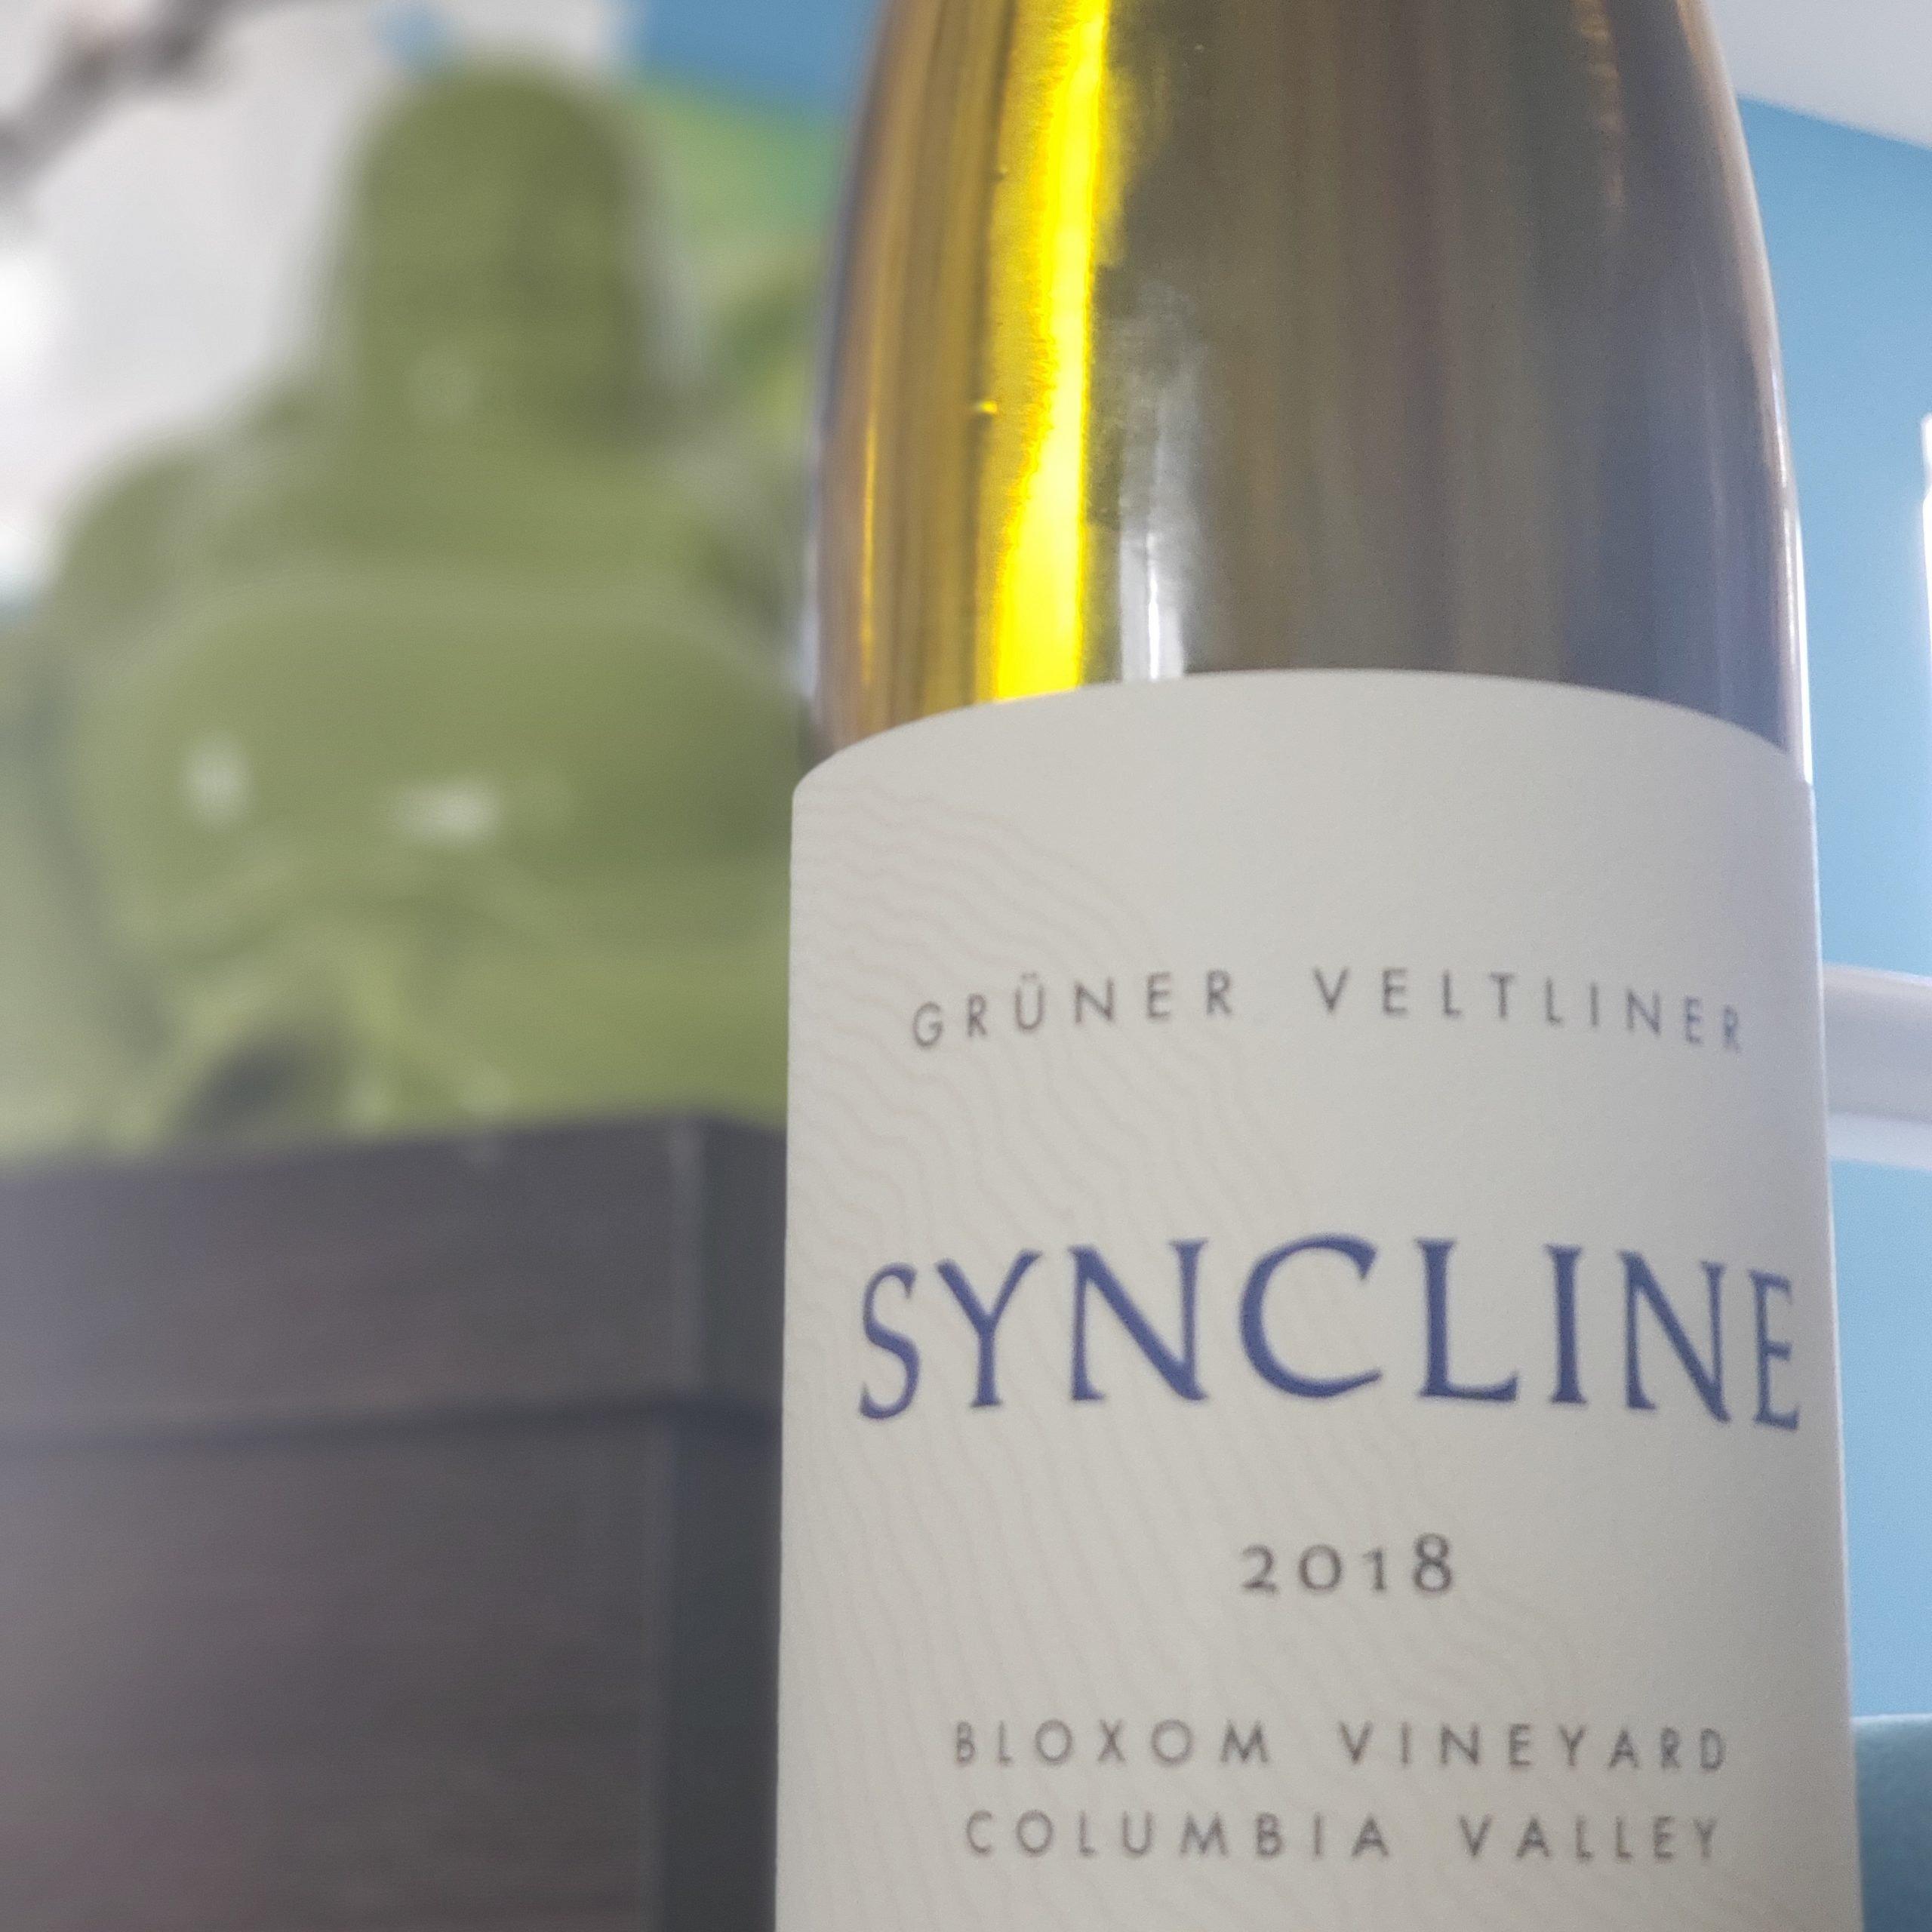 2018 Grüner Veltliner from Syncline #travelinabottle